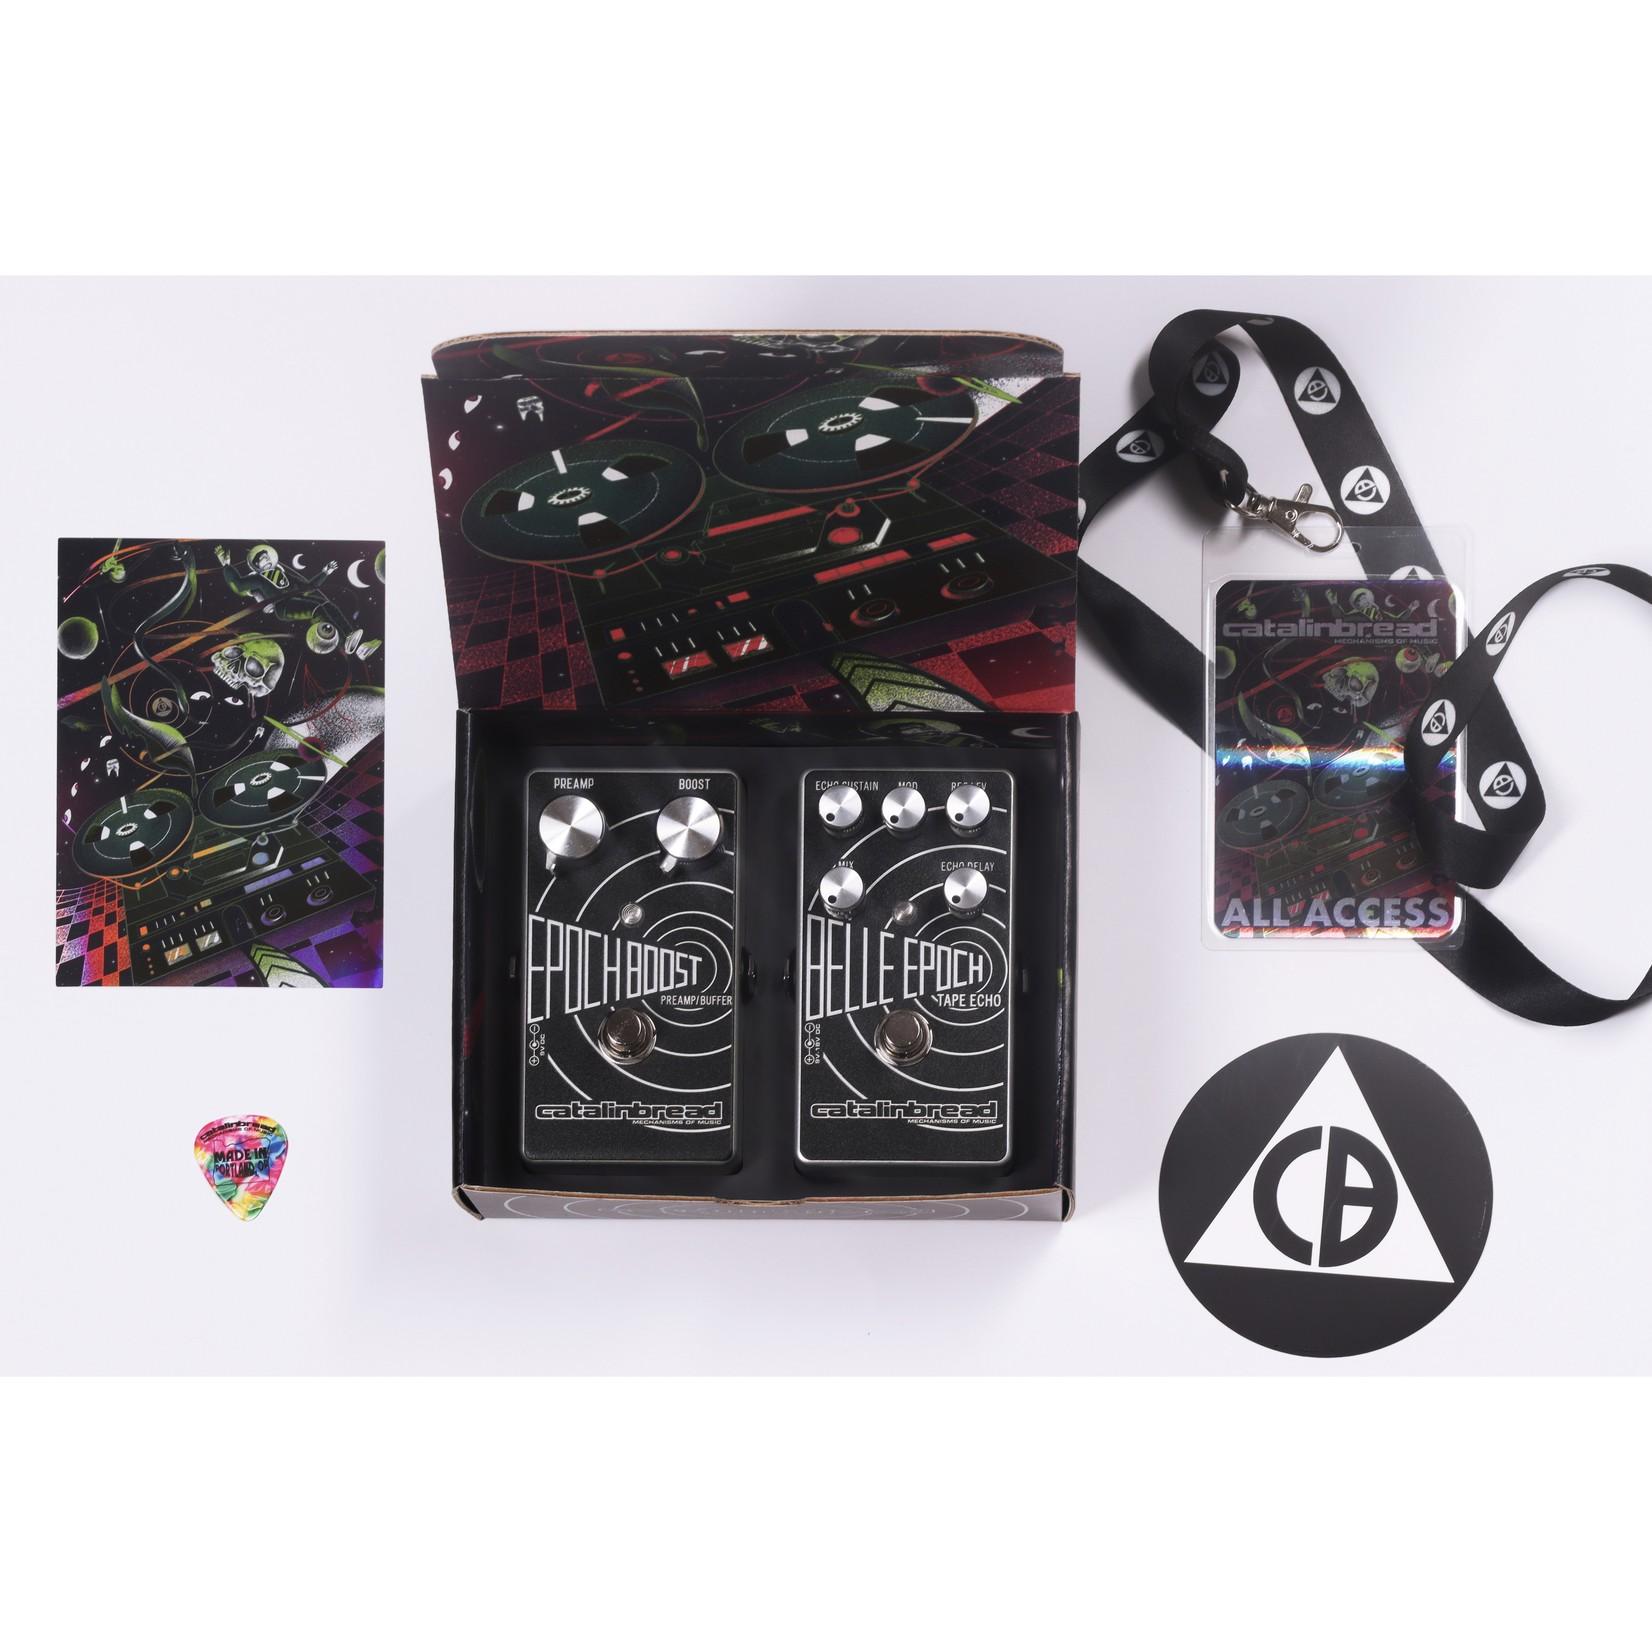 Catalinbread Catalinbread Limited Edition Epoch Box Set (Epoch Boost  Preamp/Buffer + new look Belle Epoch Tape Echo)